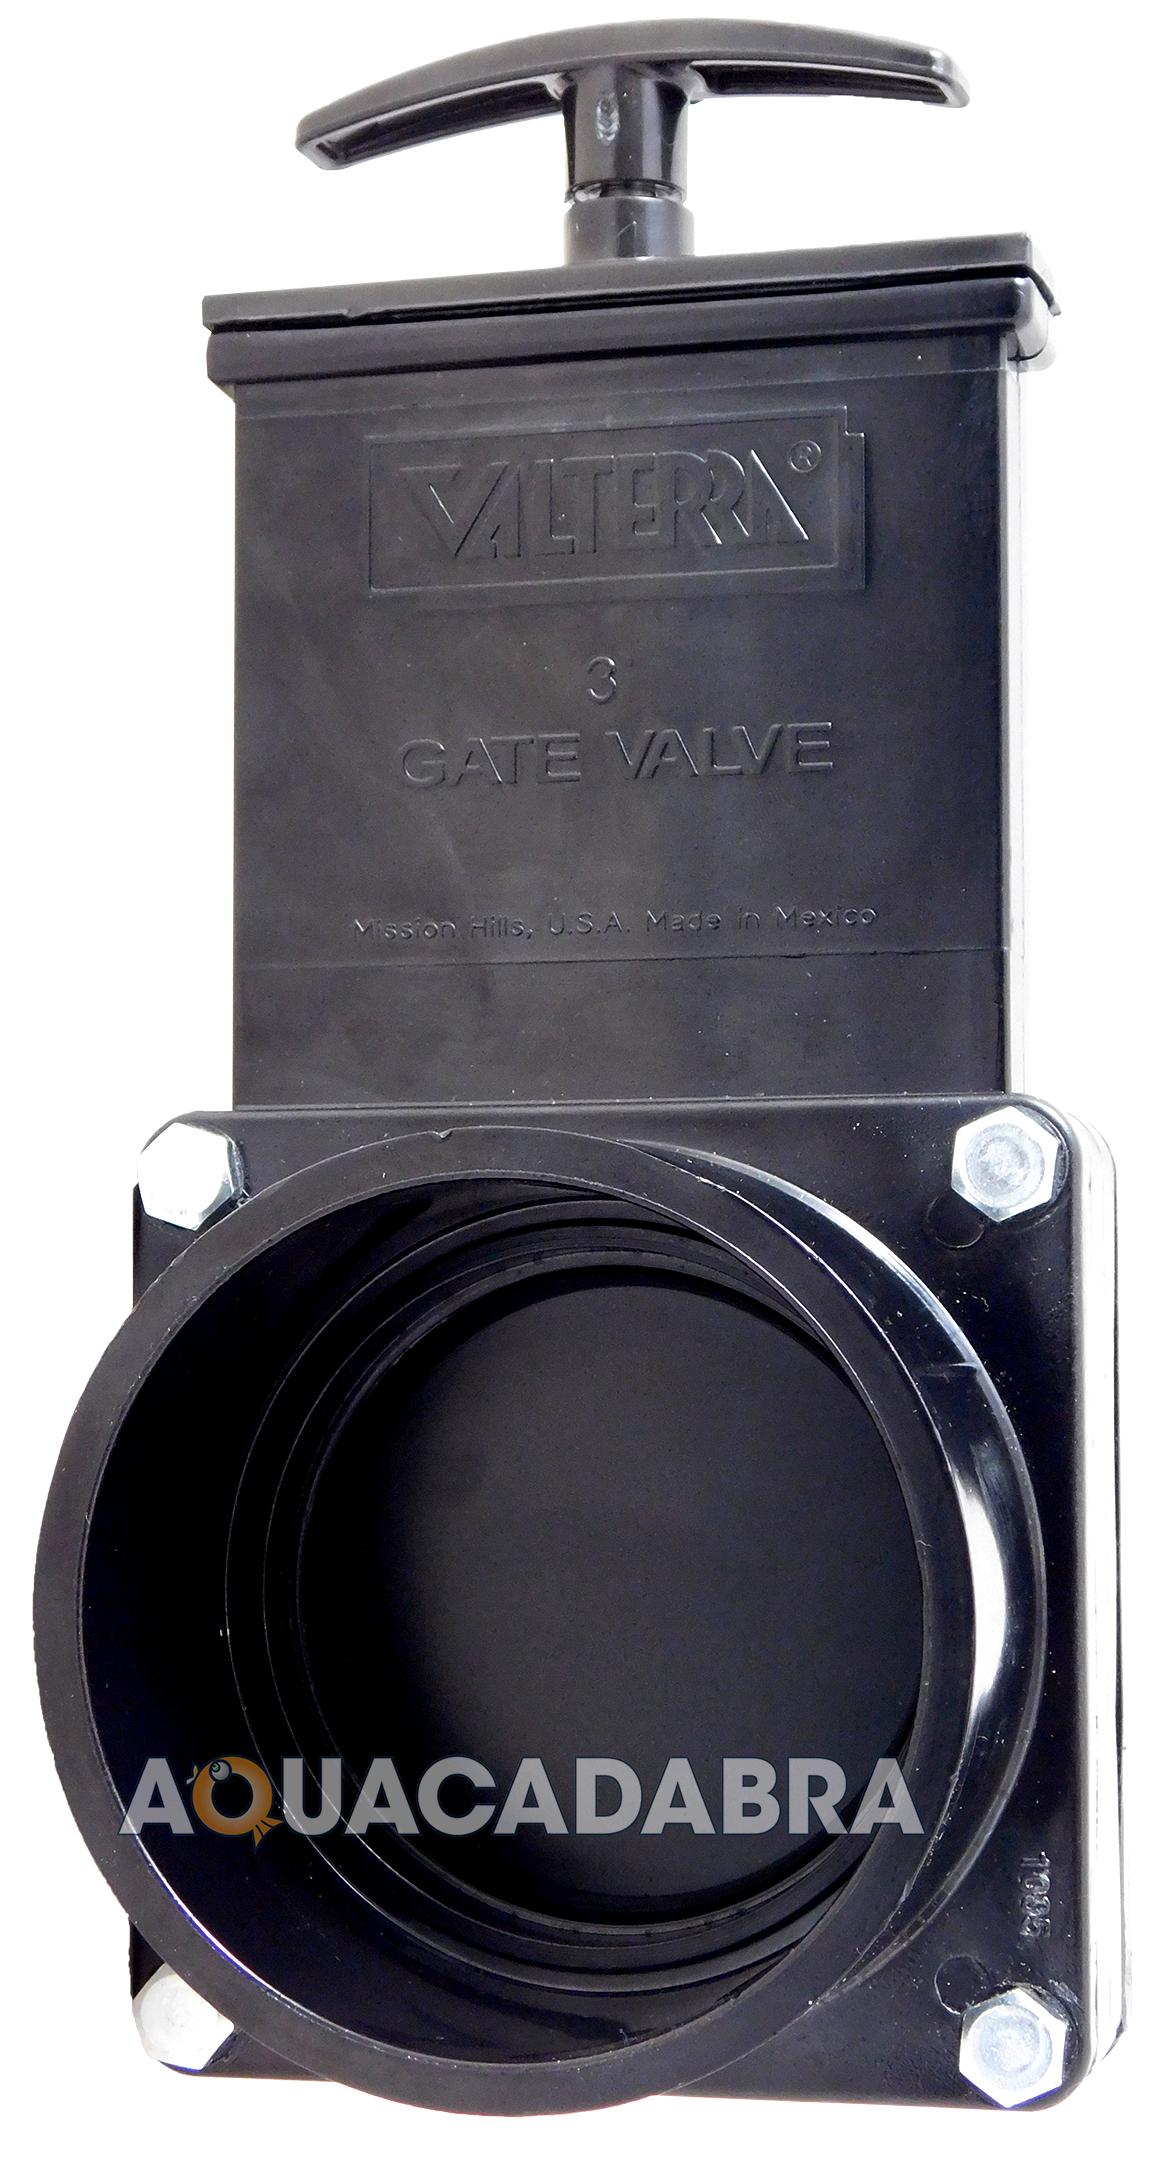 genuine valterra outlet pipe slide gate valve koi fish On pond filter pipe